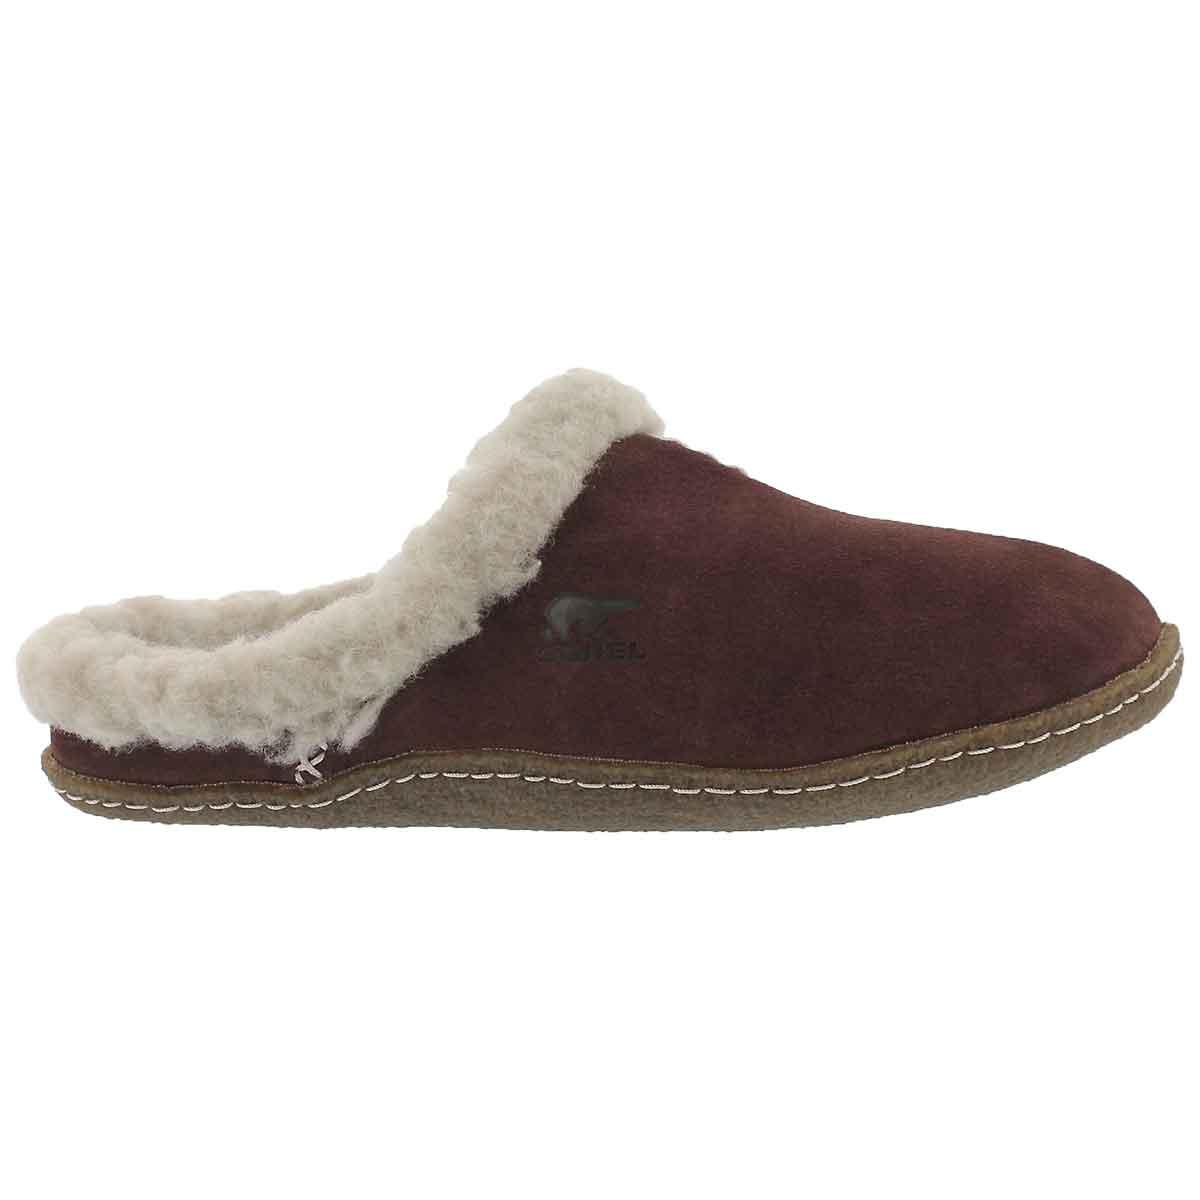 Lds Nakiska Slide redwood suede slipper